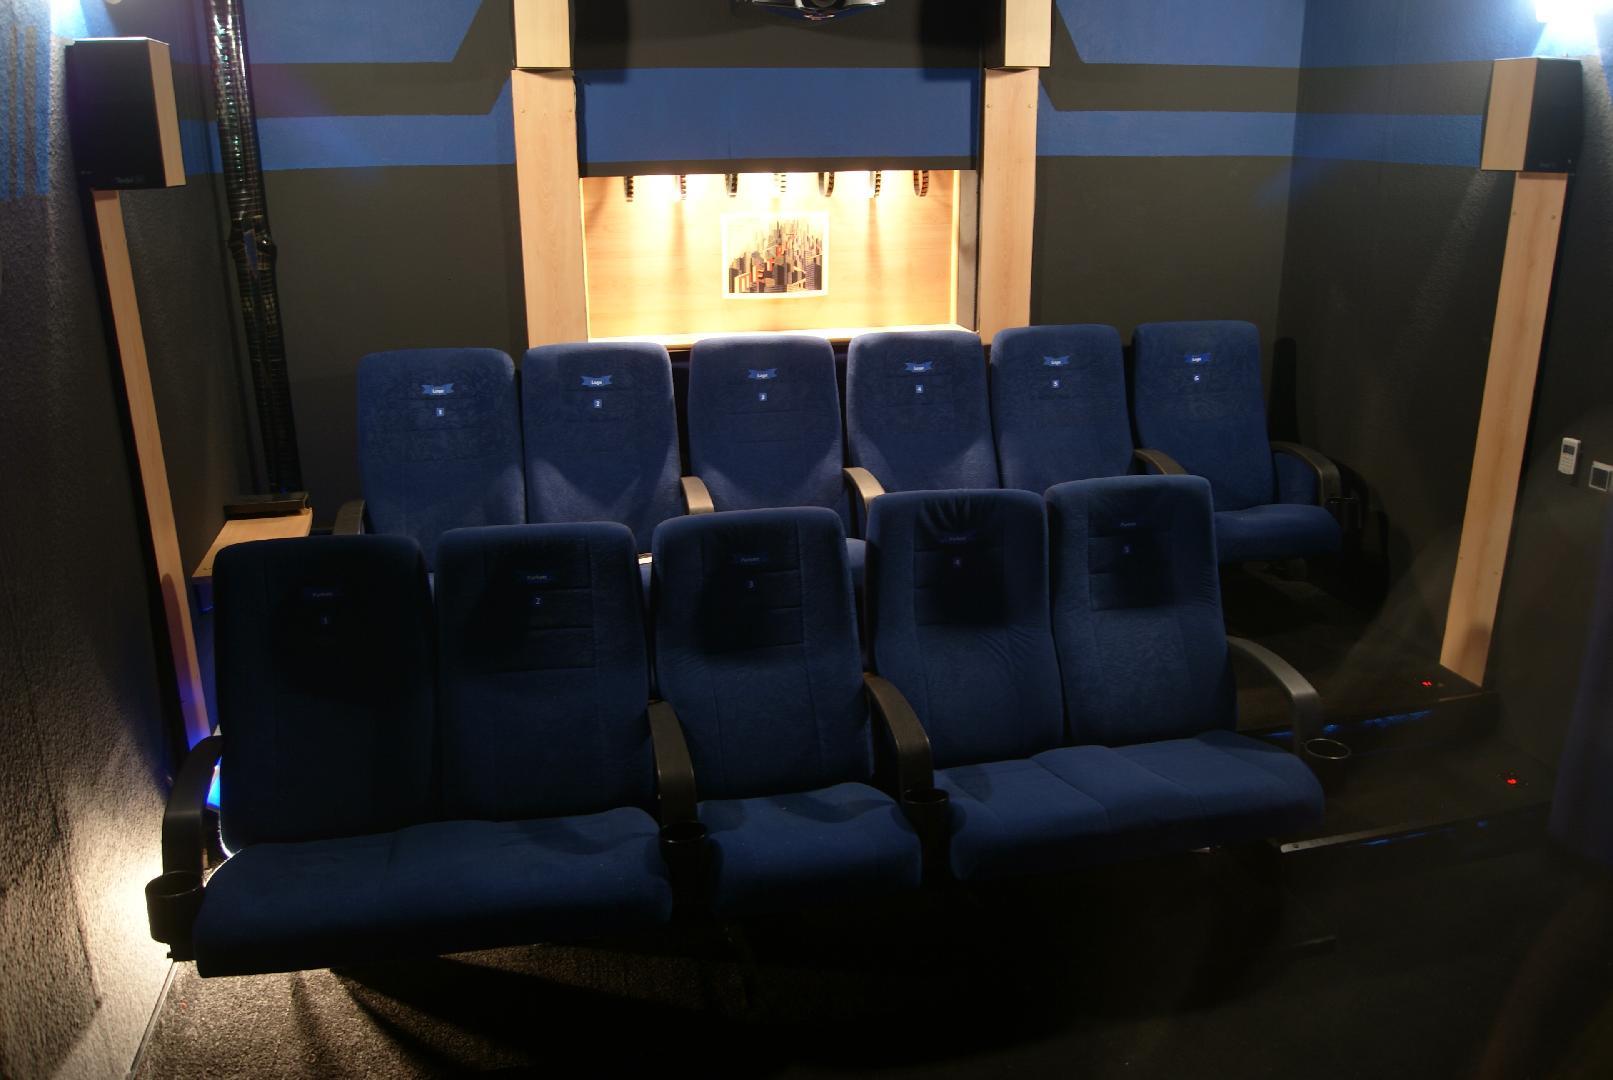 Picture 3 of Trarpalast - Berlin Screening Room inkl. Salon Flügel